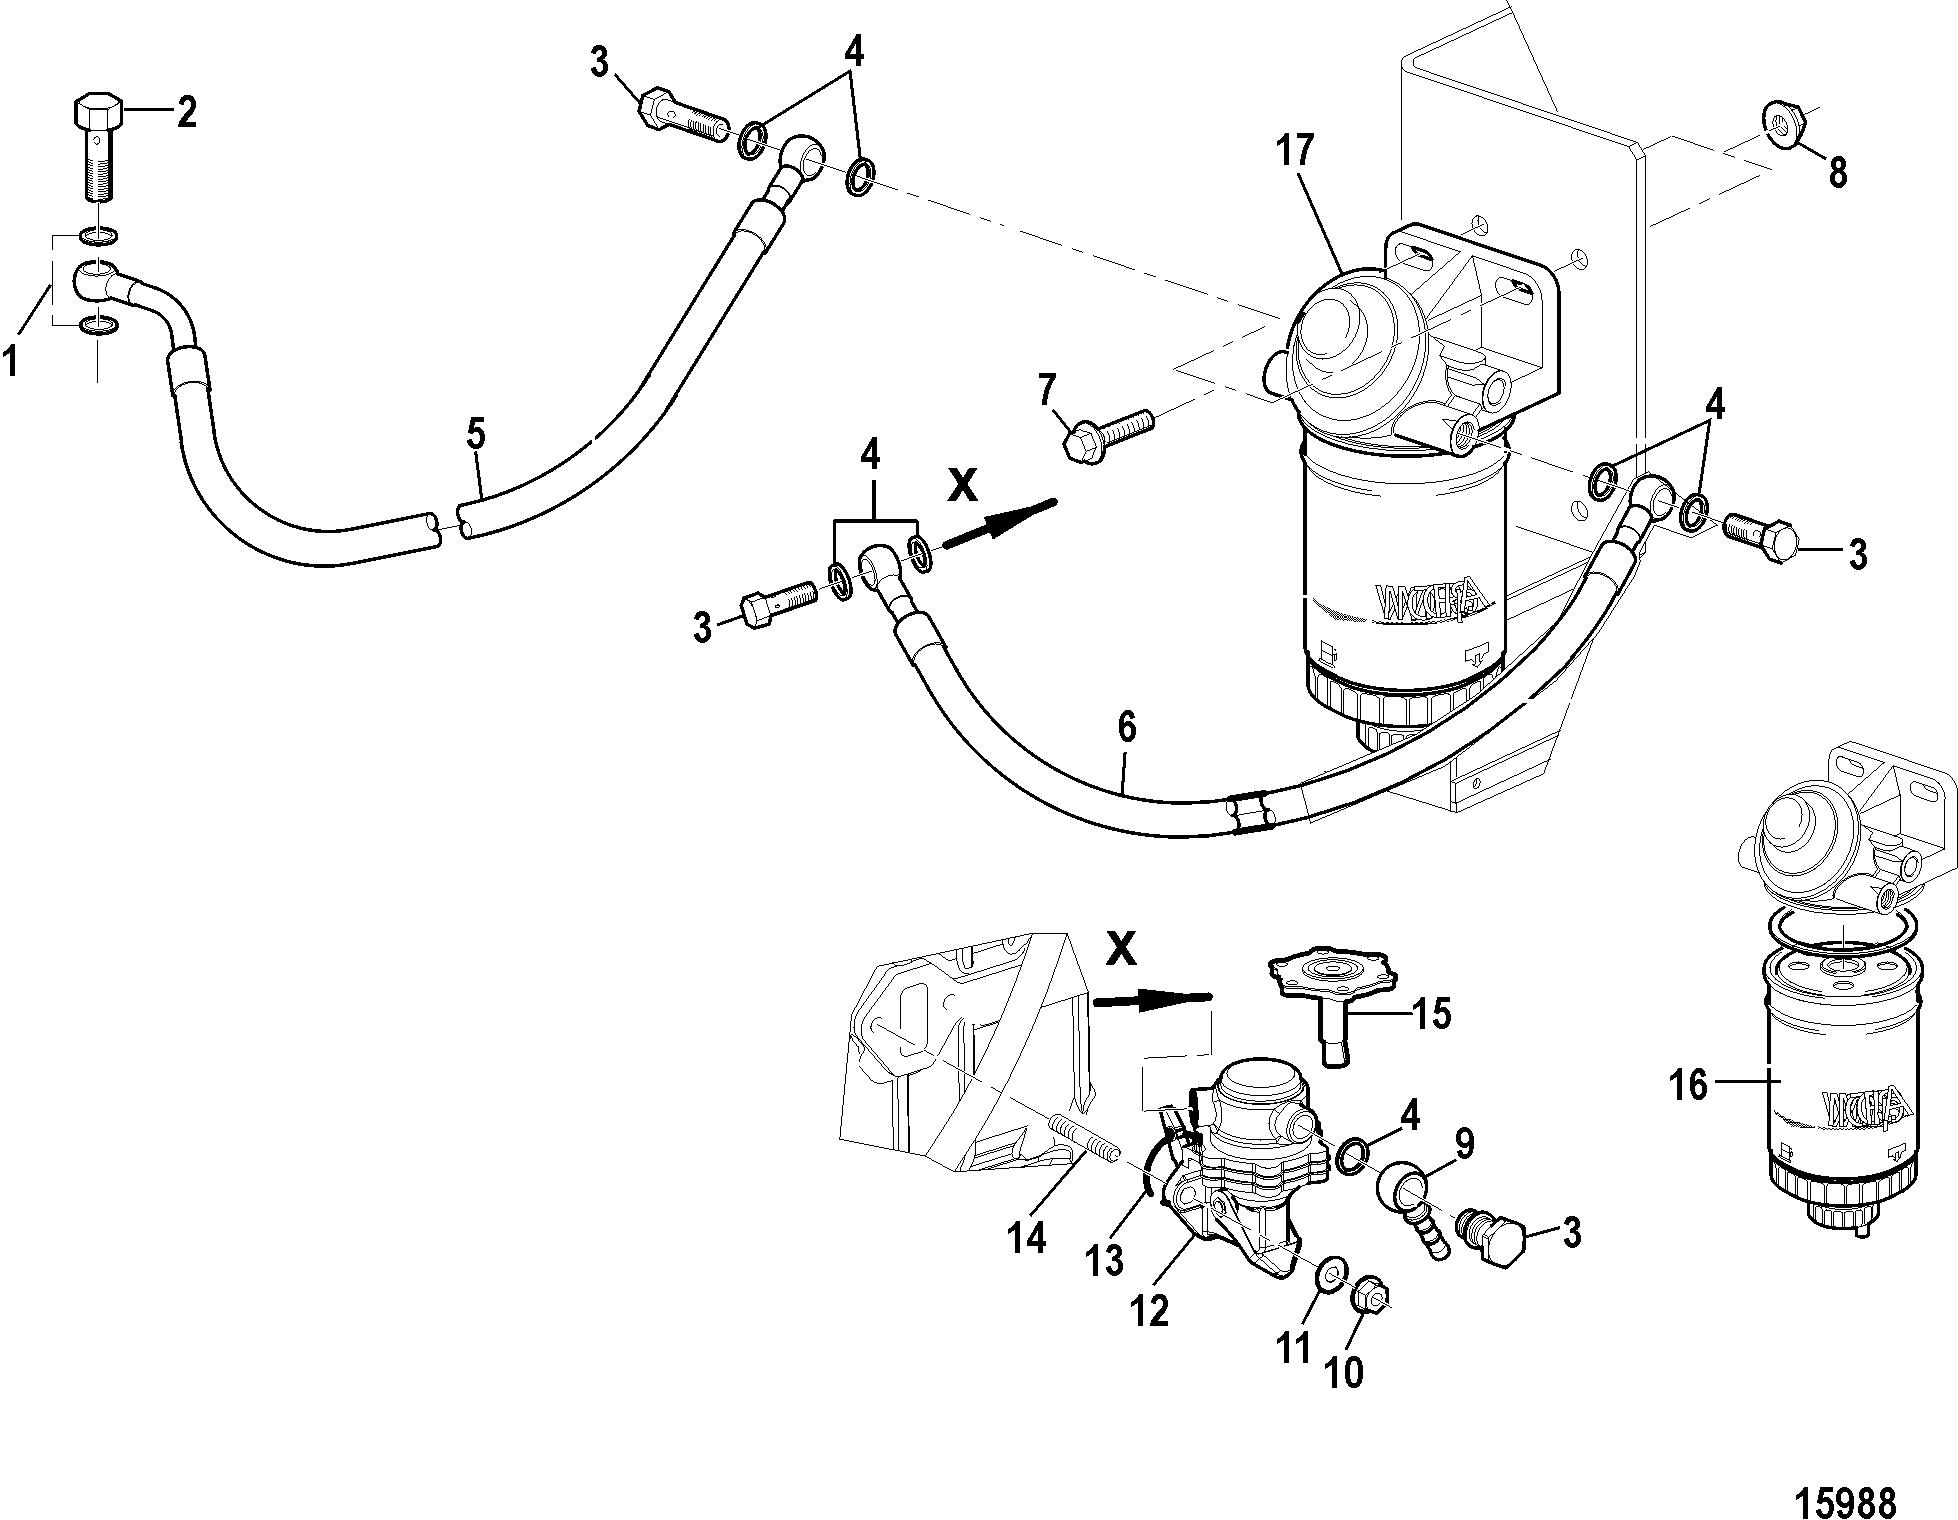 Каталог запчастей MERCRUISER остальные CMD 4.2 EI 270